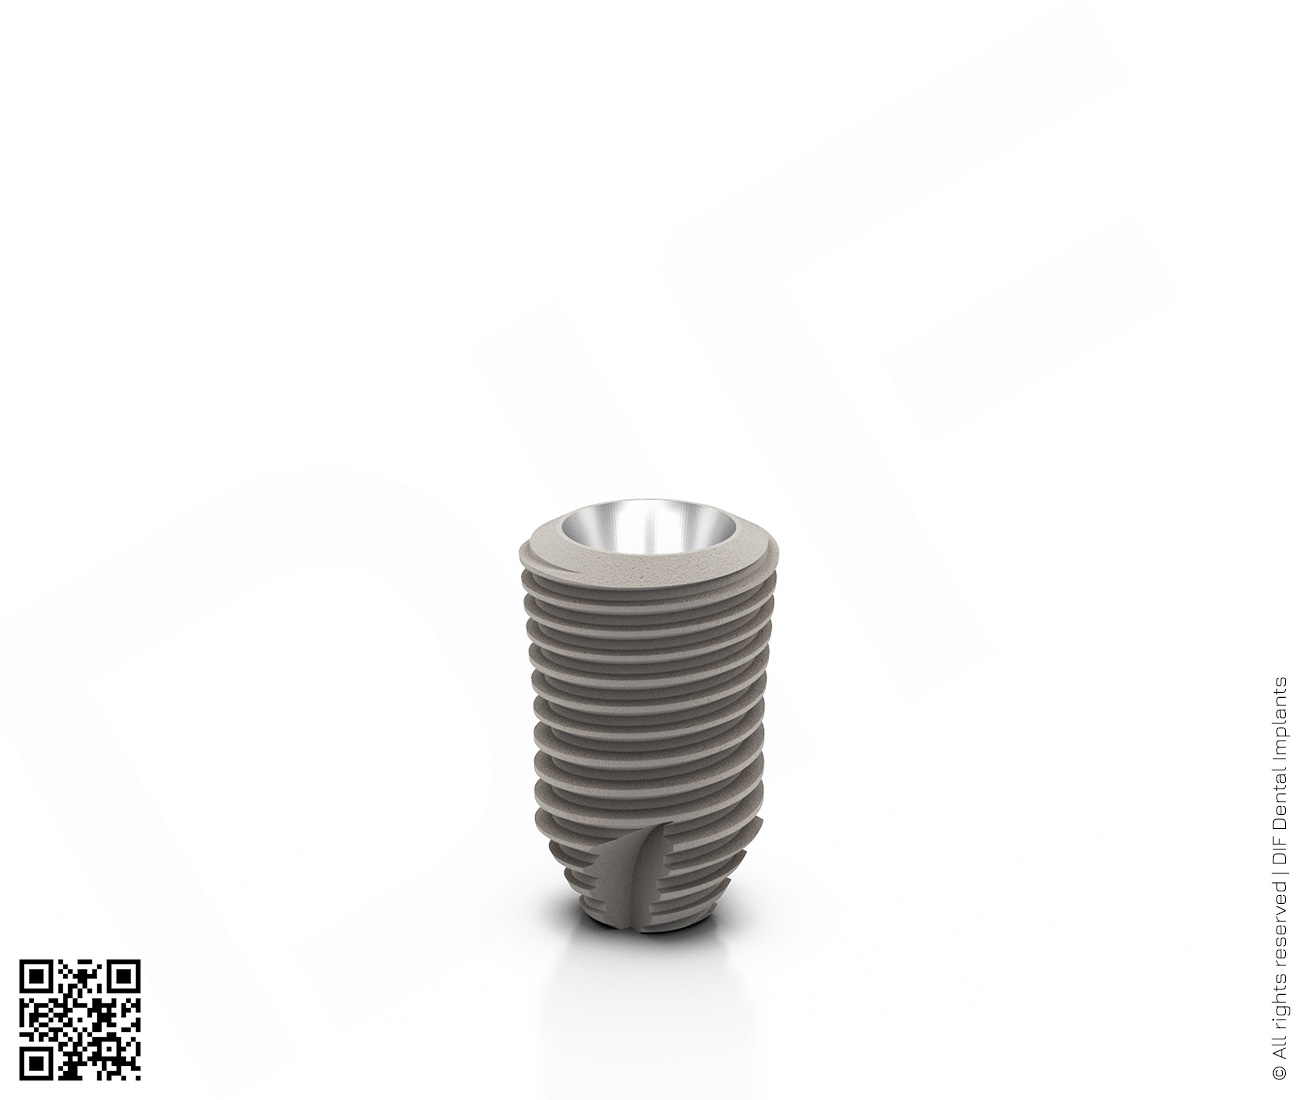 Фото имплантат mainstream fine d5.0 мм – l8.0 мм  производства DIF.